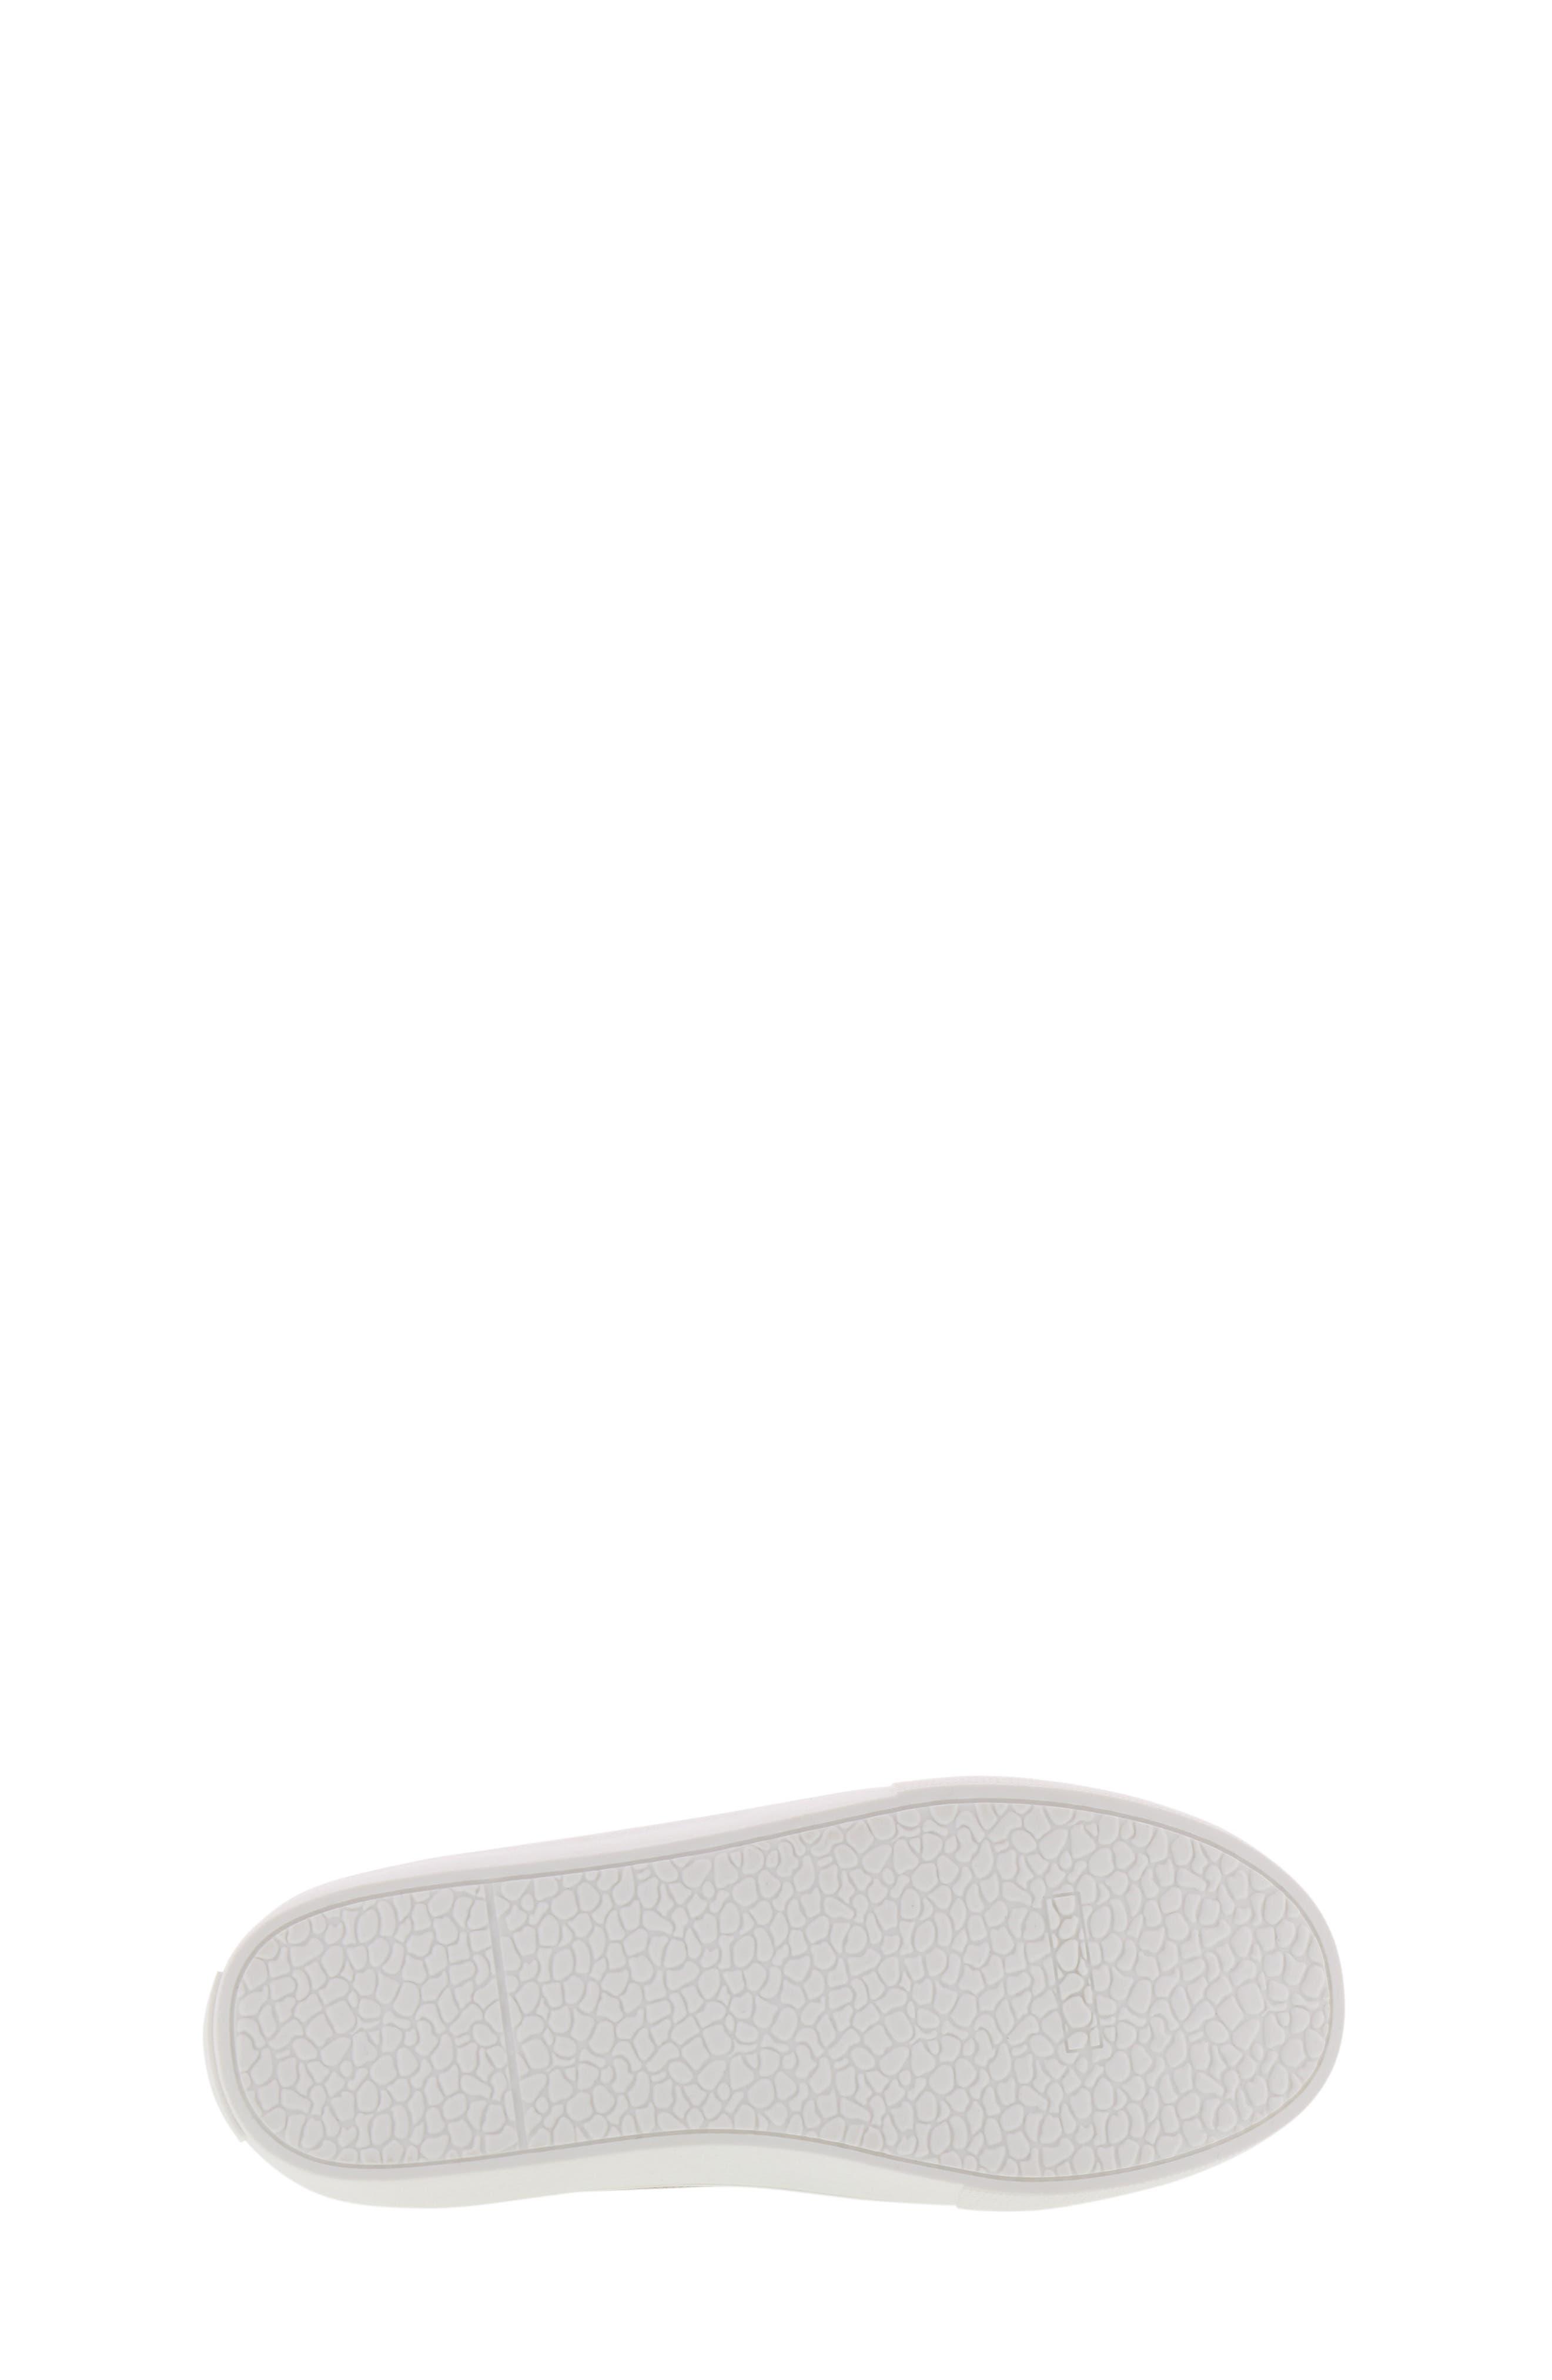 Bella Aqua Slip-On Sneaker,                             Alternate thumbnail 6, color,                             GASOLINE IRIDESCENT